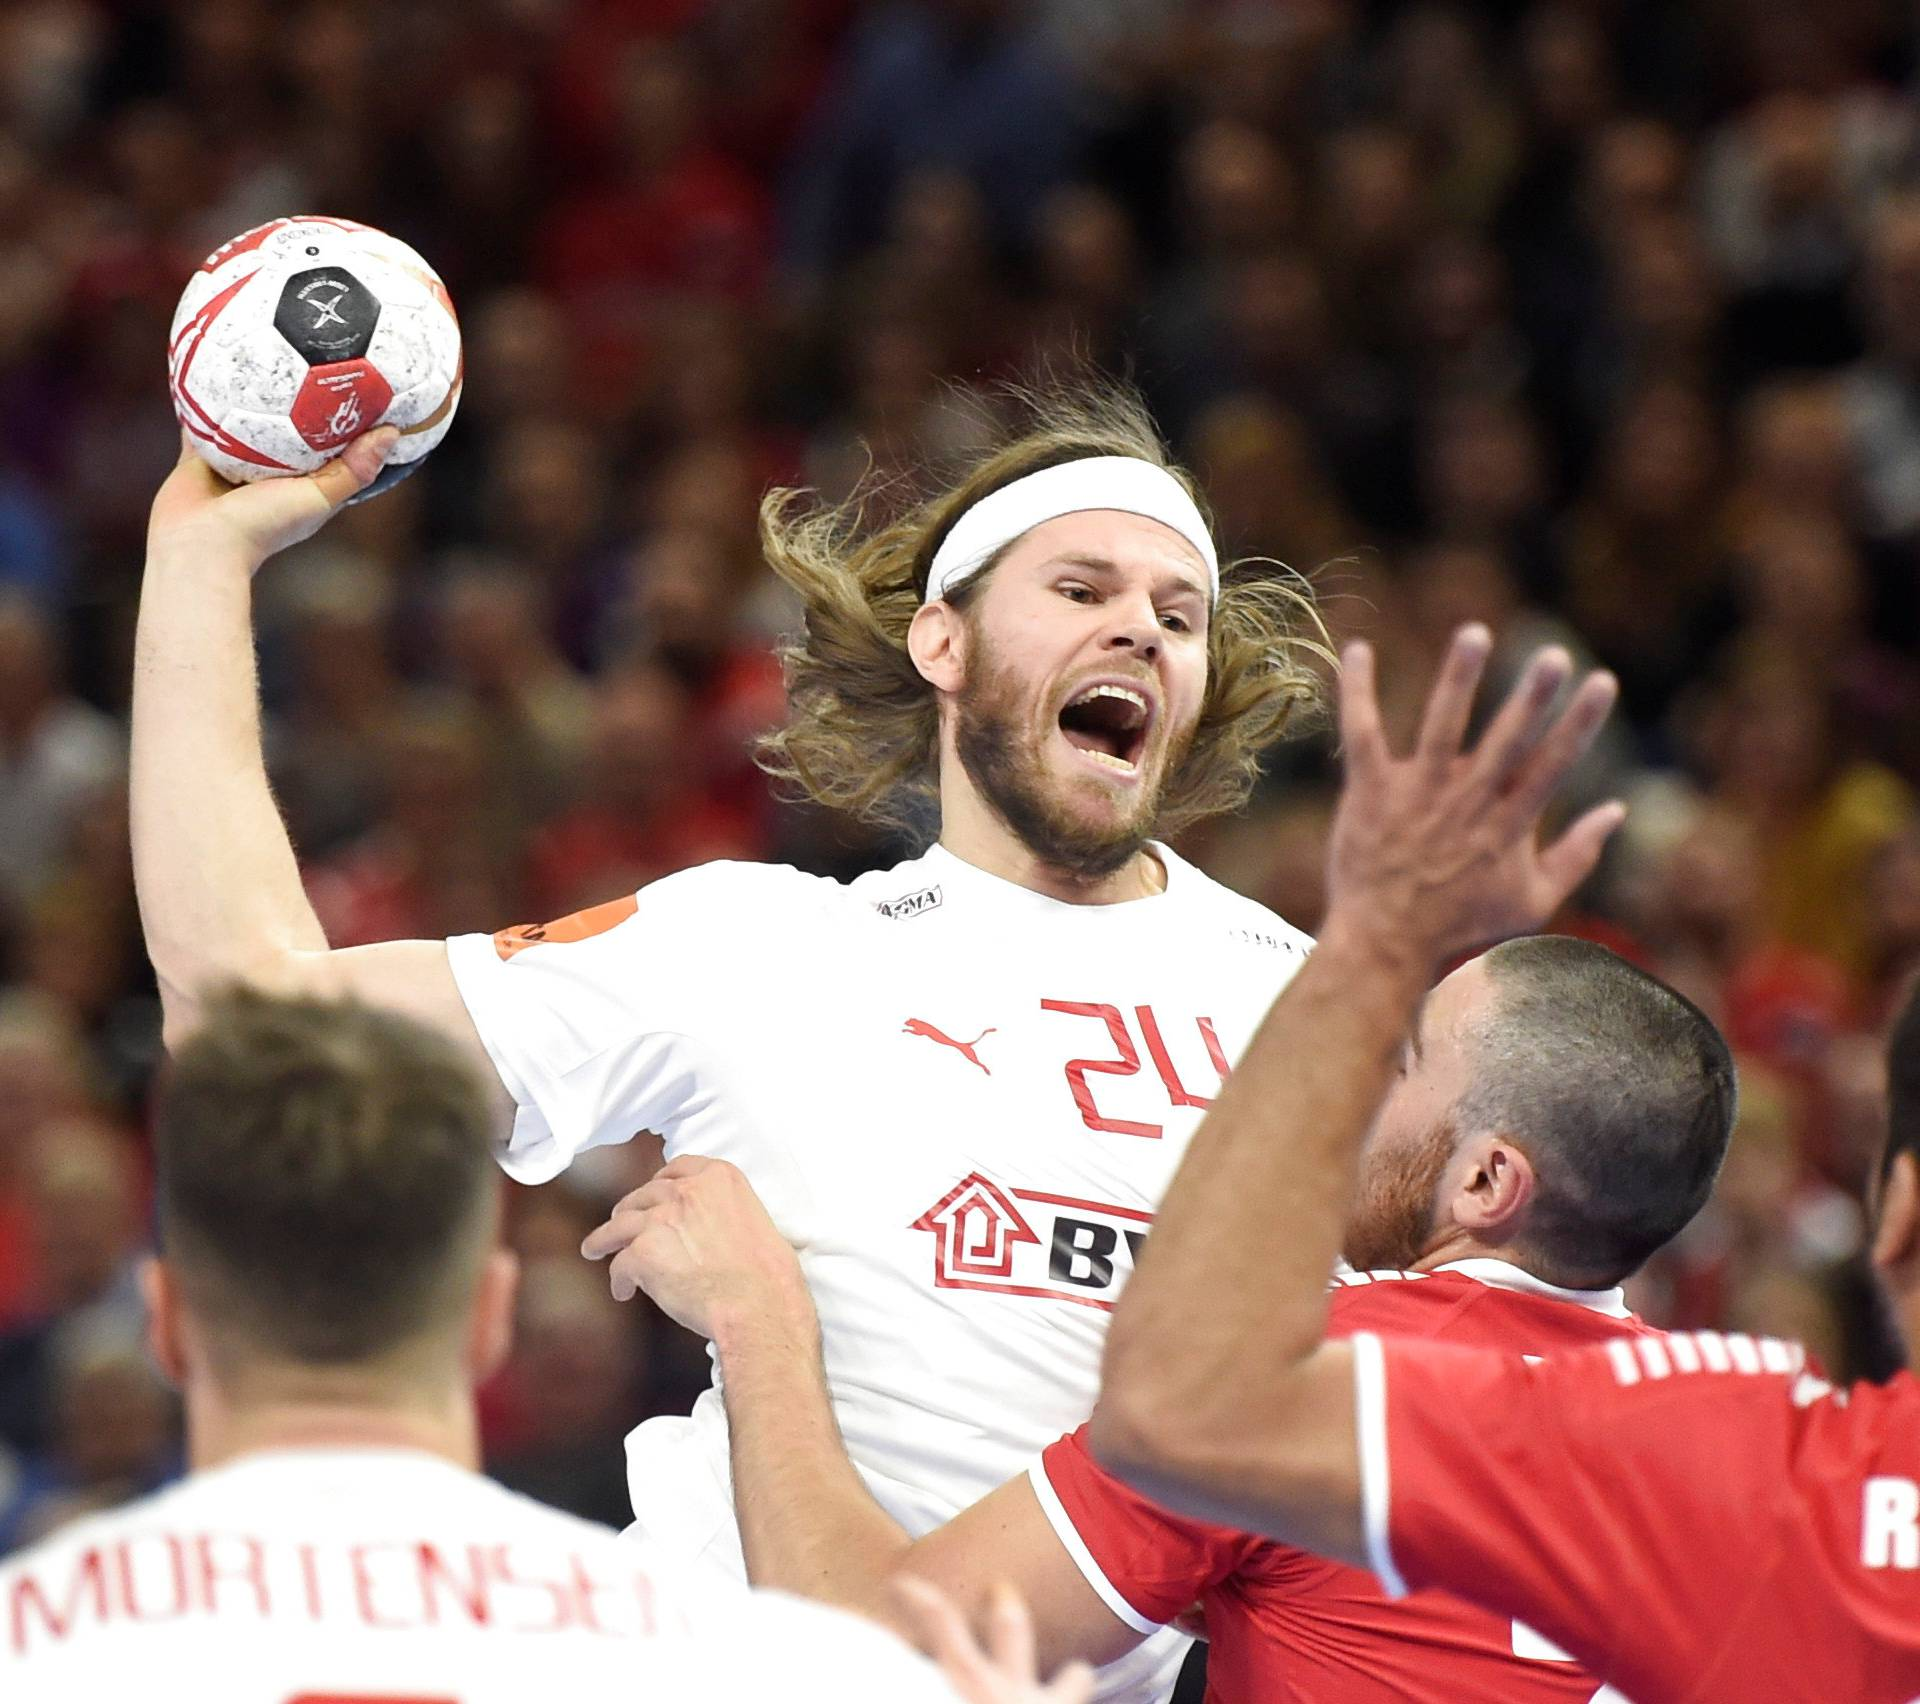 IHF Handball World Championships